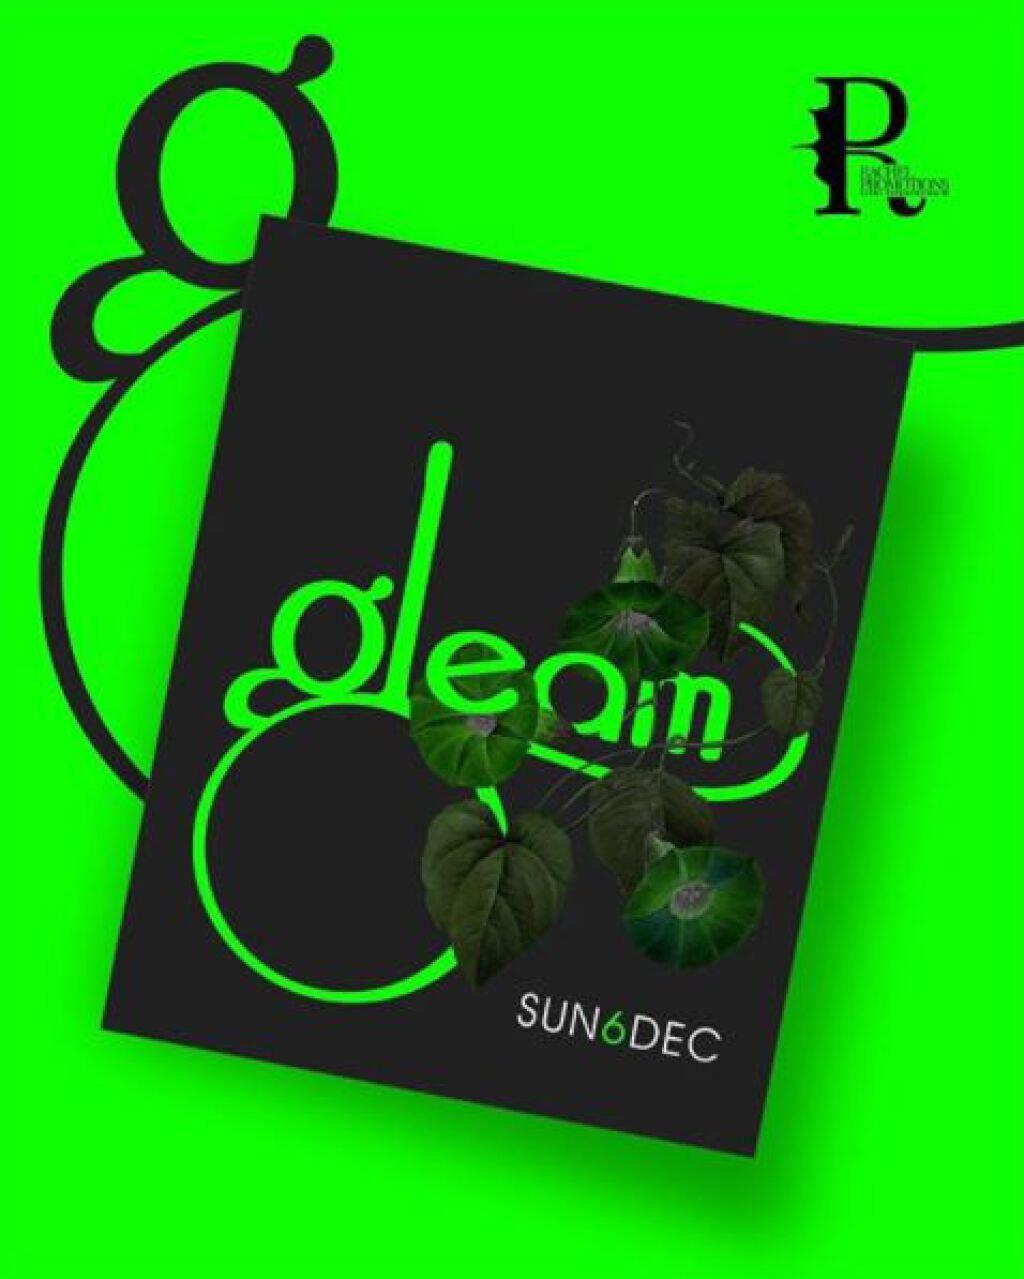 Gleam flyer or graphic.